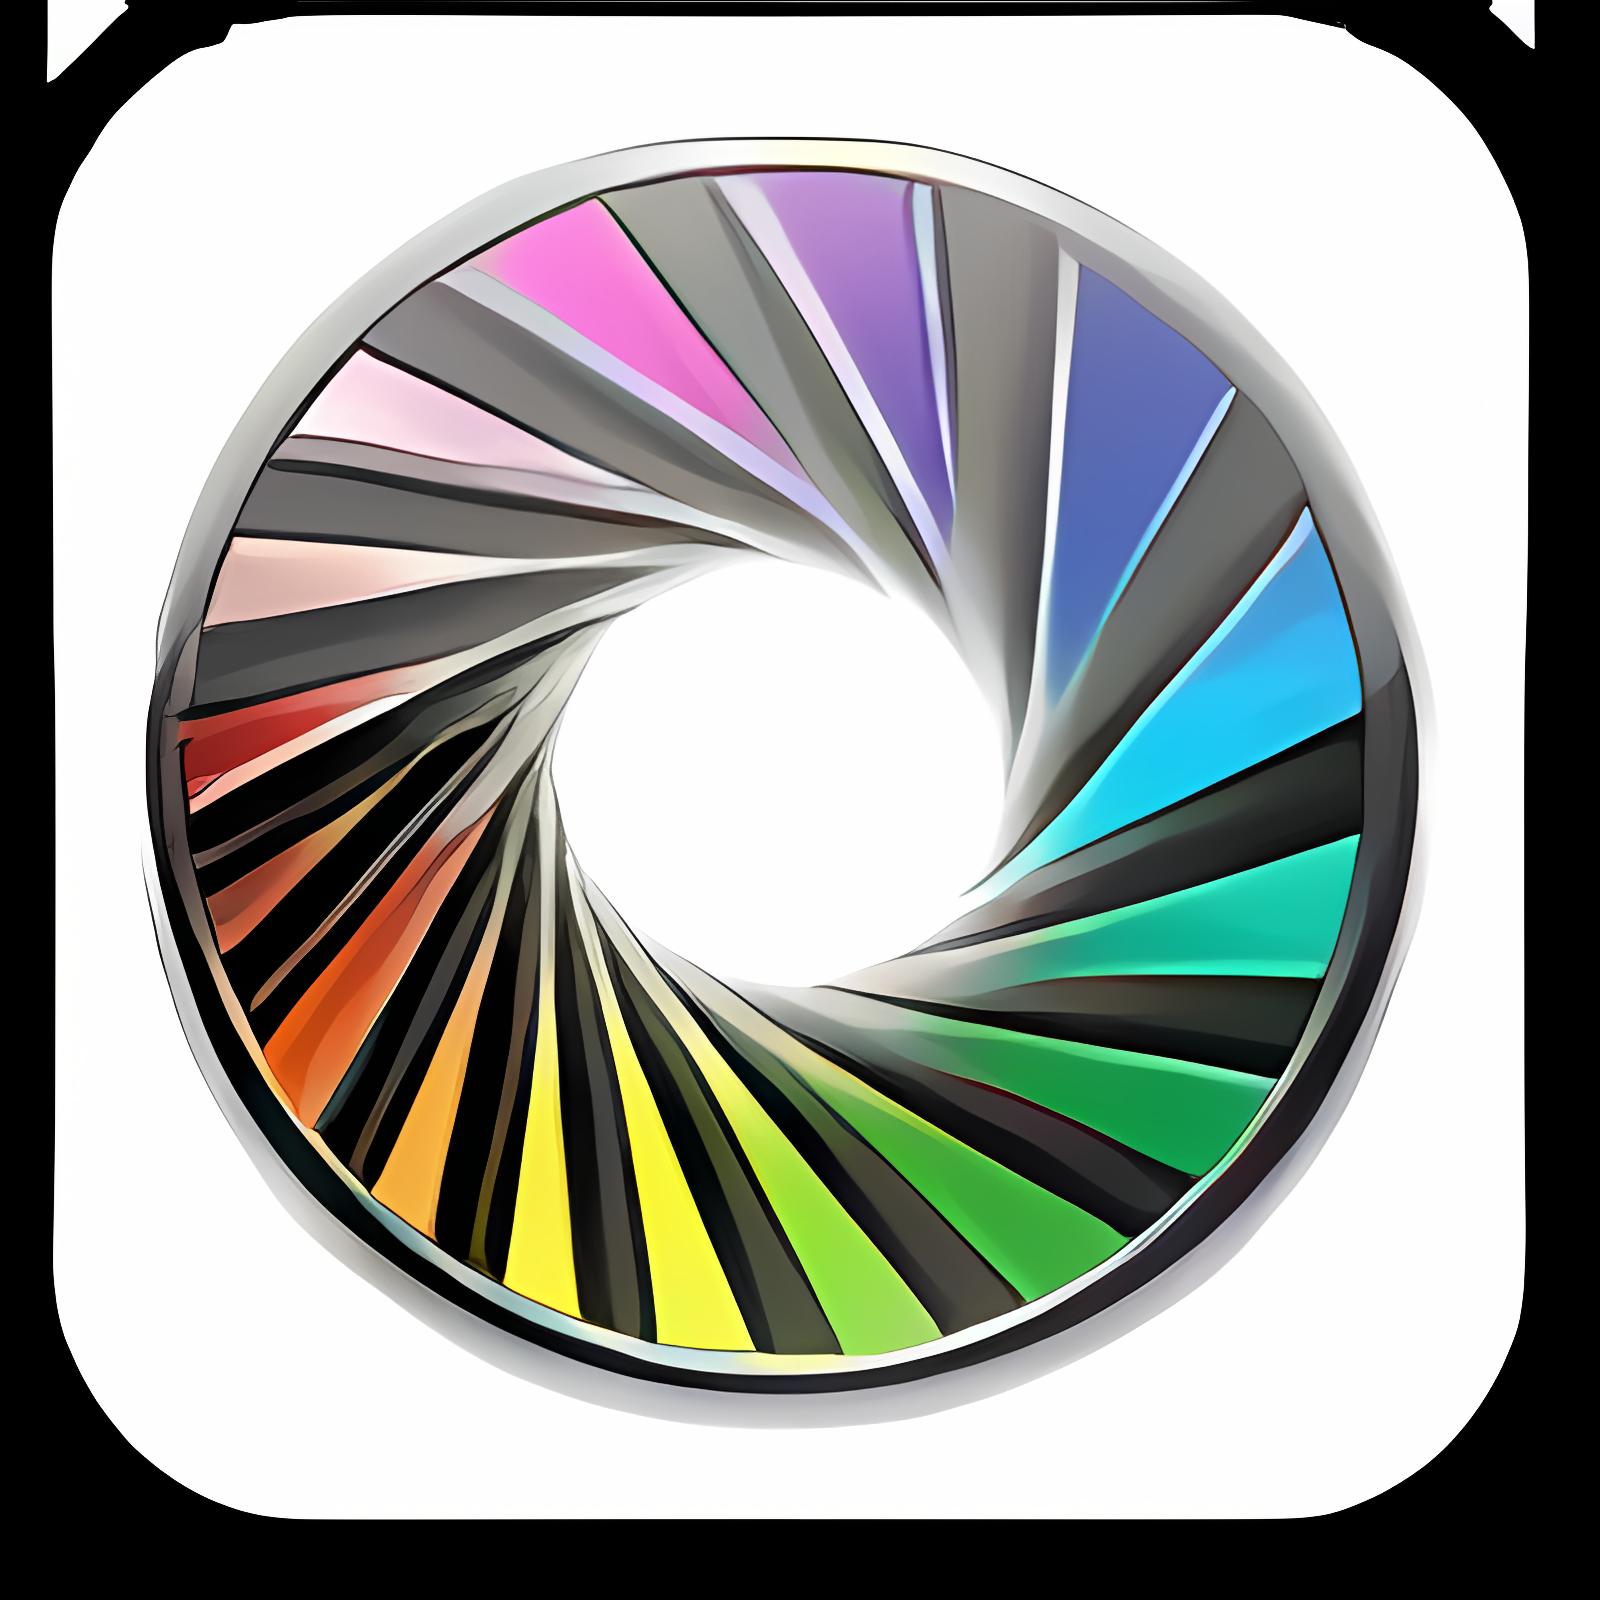 MacPaint X 0.3 Beta